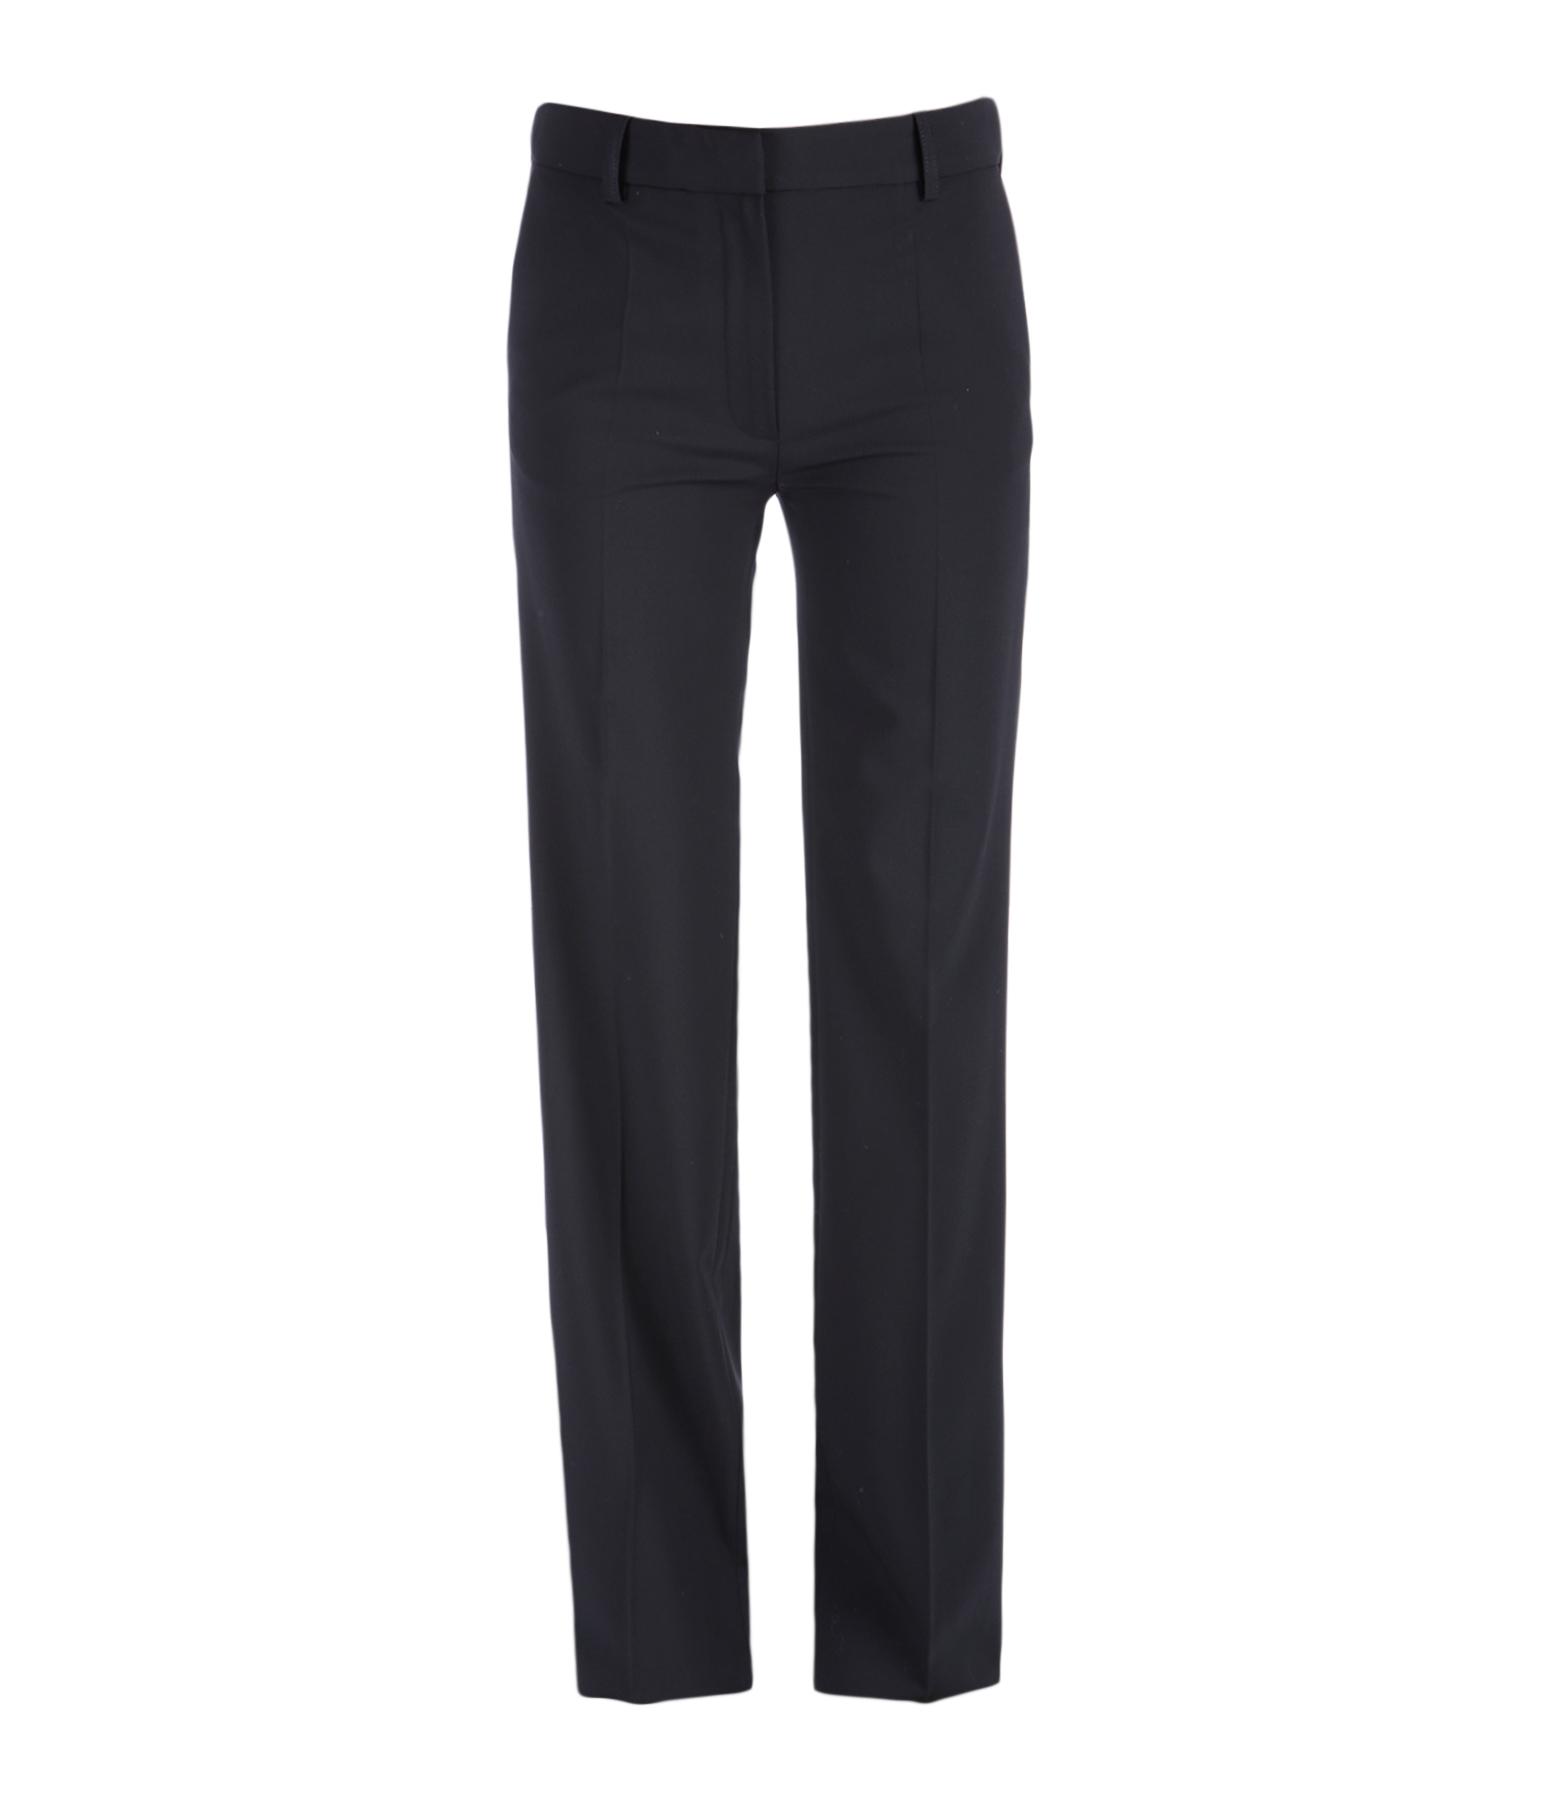 Pantalon Gauvain Laine Noir